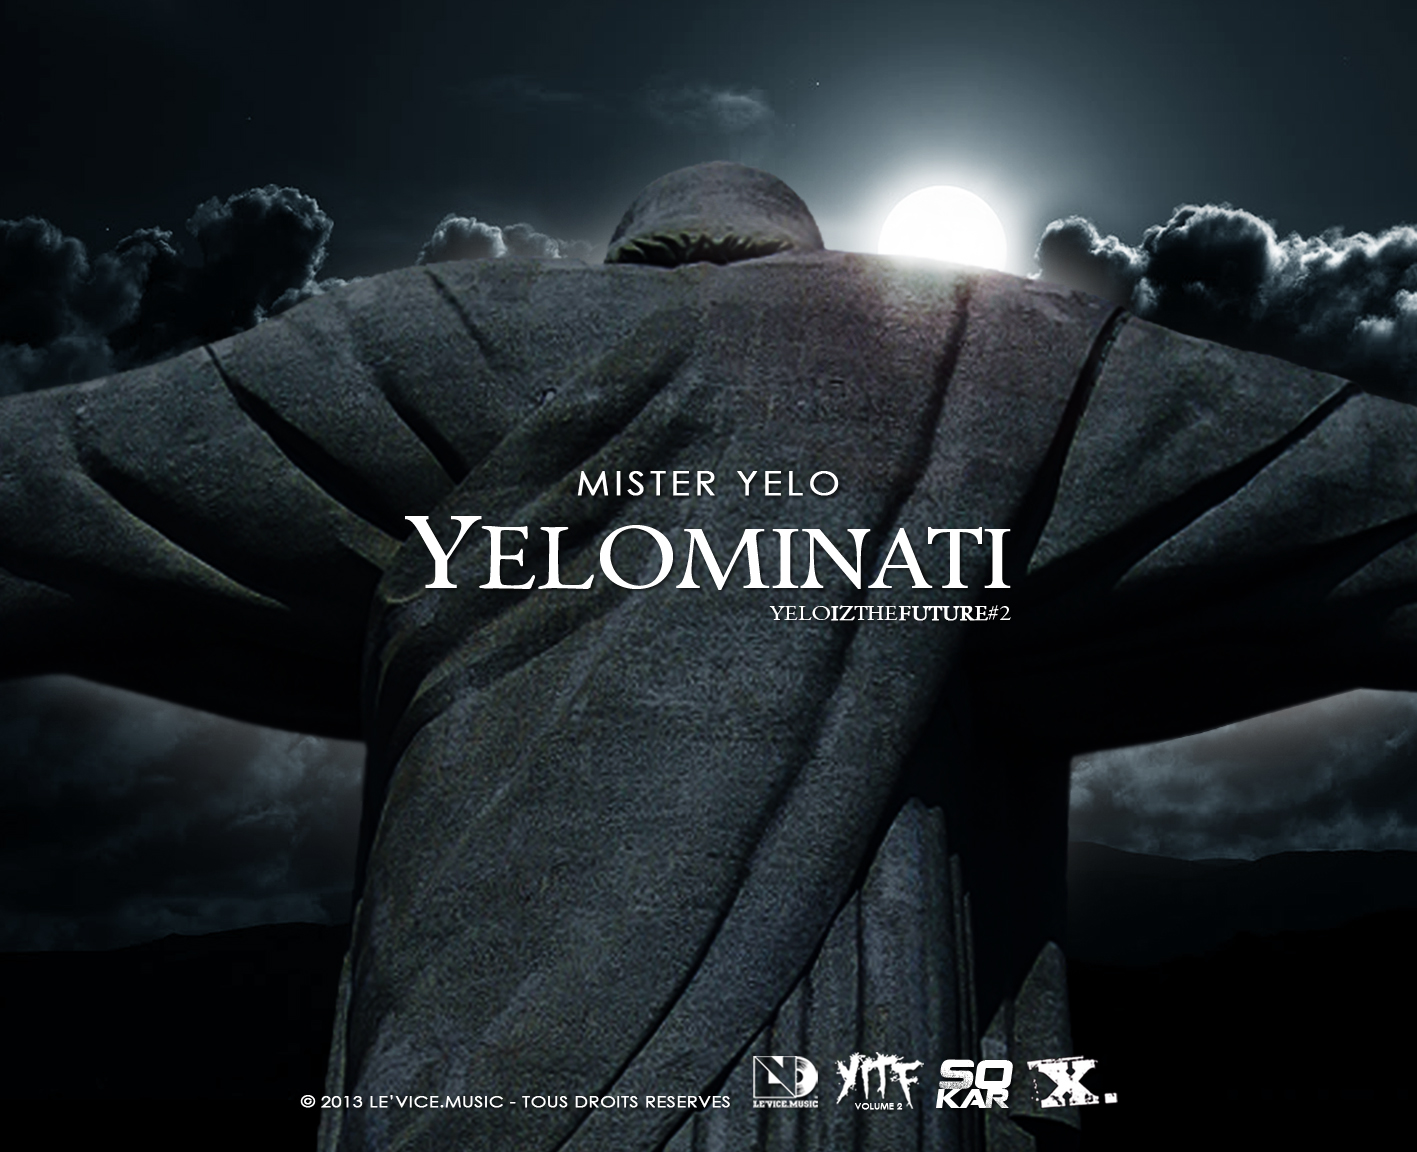 Yelominati pochette front